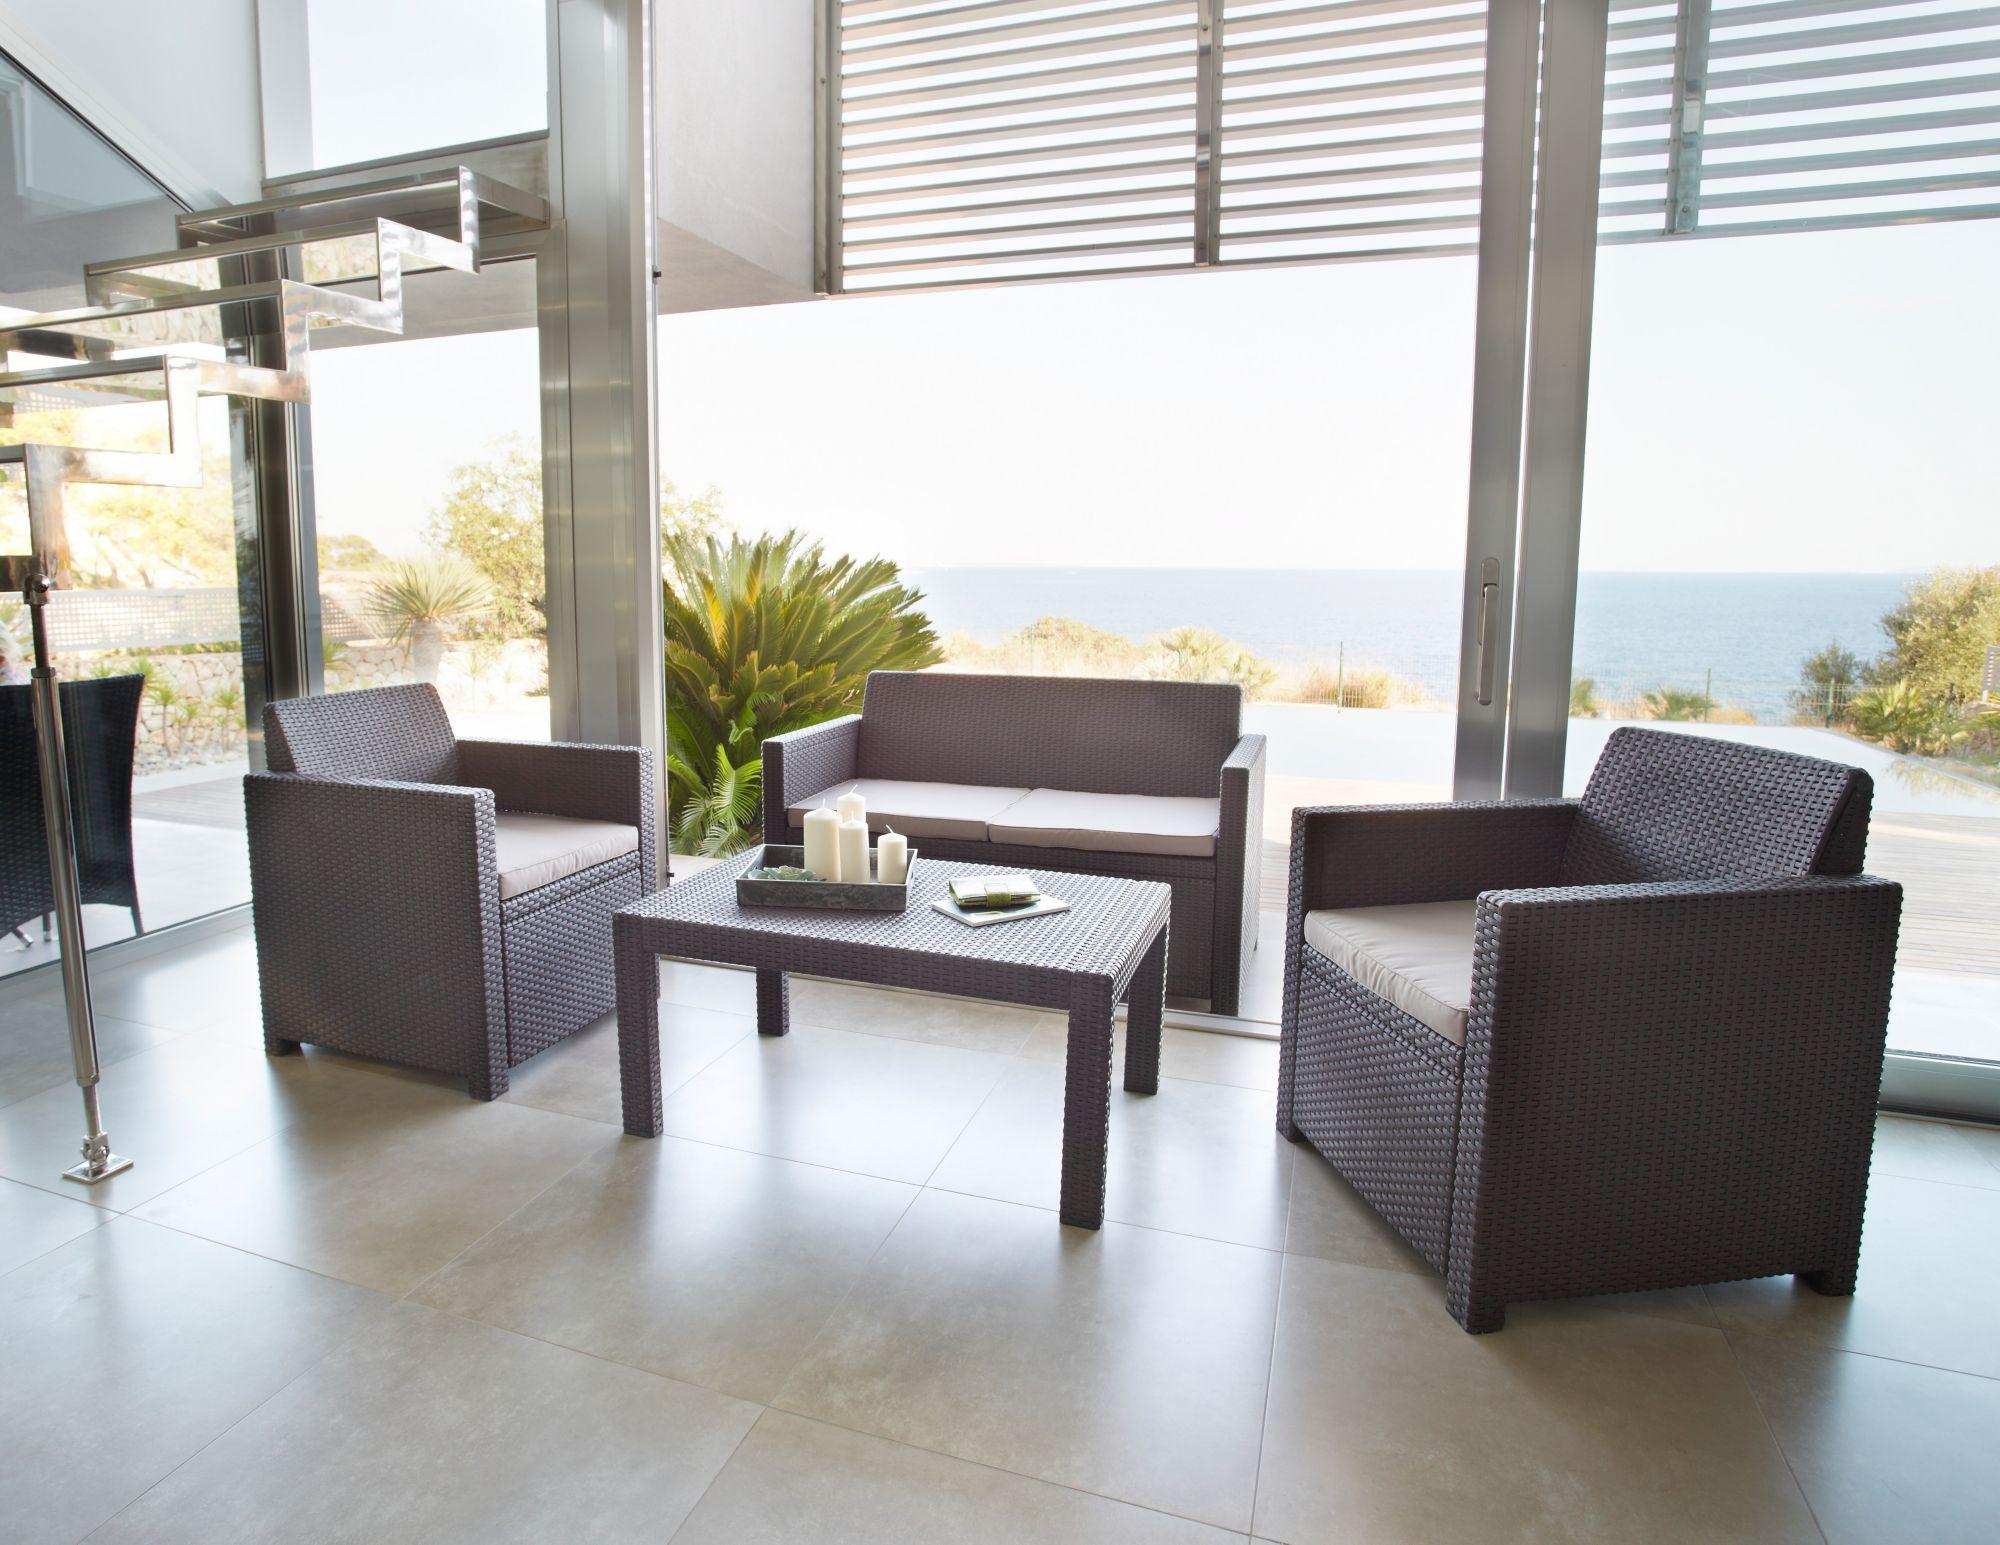 8-tgl. Loungeset »Merano«, 2er-Sofa, 2 Sessel, Tisch 91x48,5 cm, Kunststoff, braun